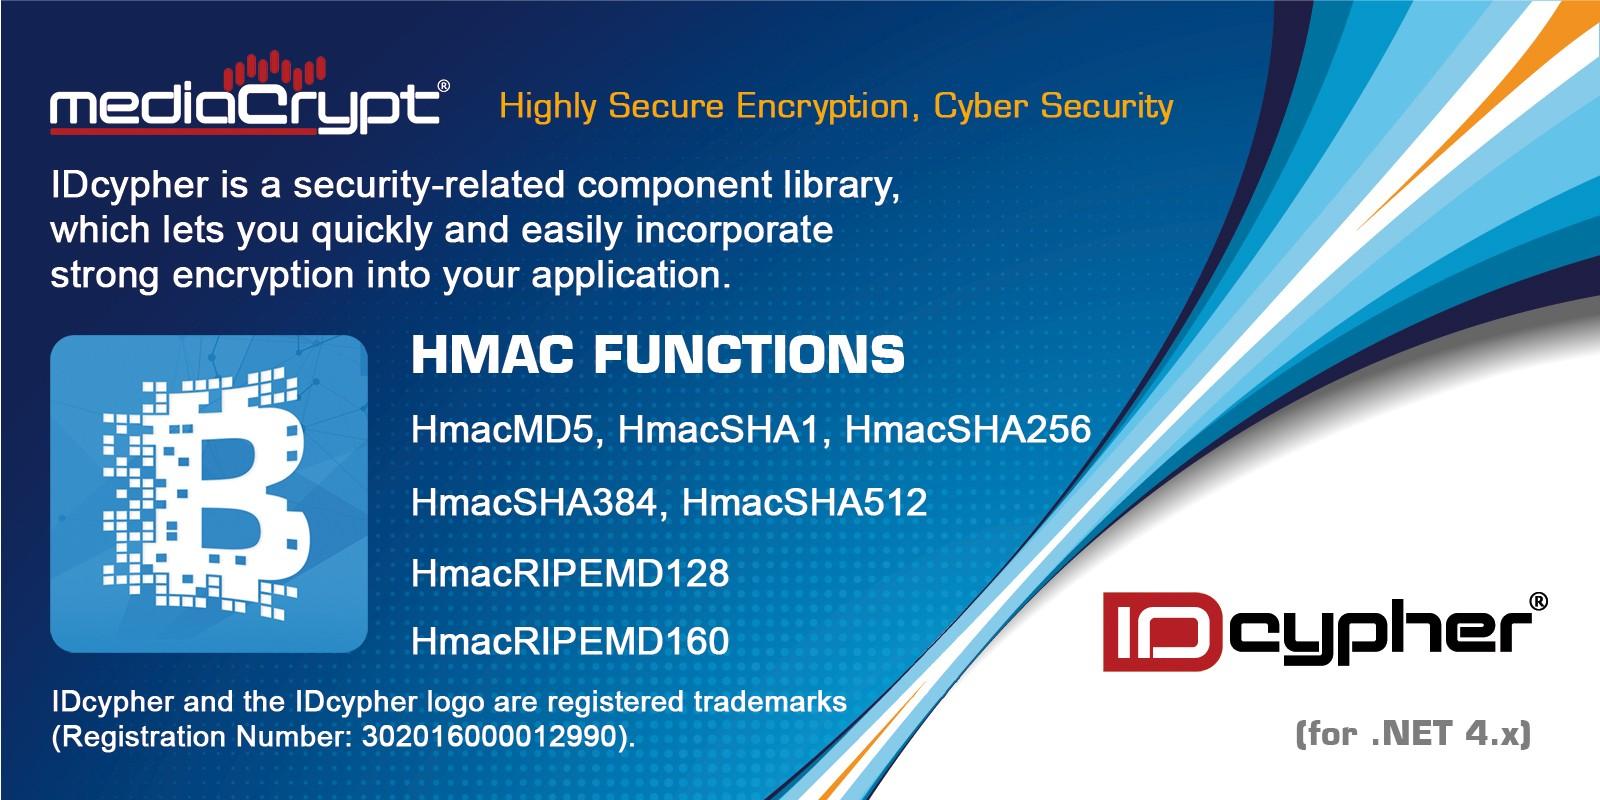 IDcypher HMAC Functions .NET